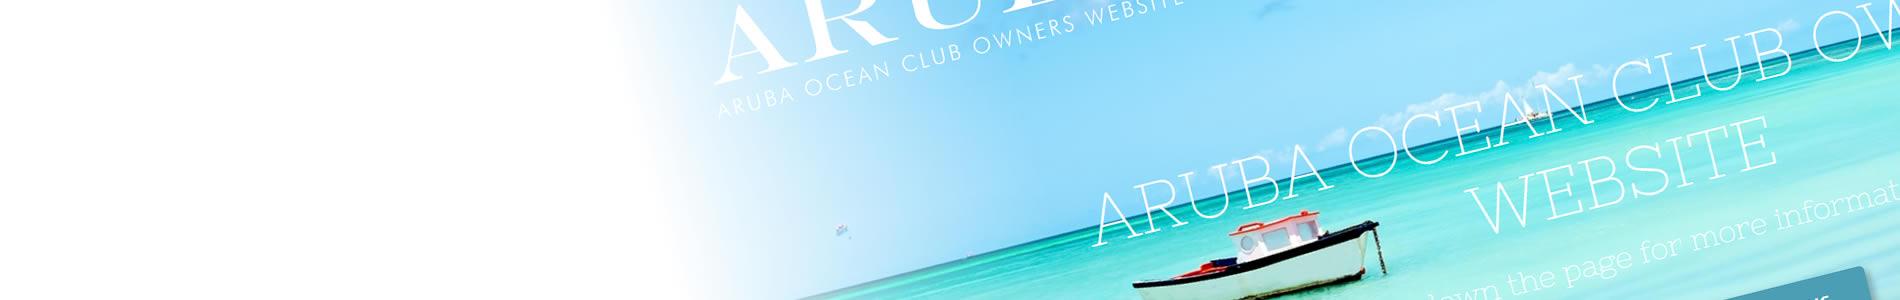 Aruba Ocean Club